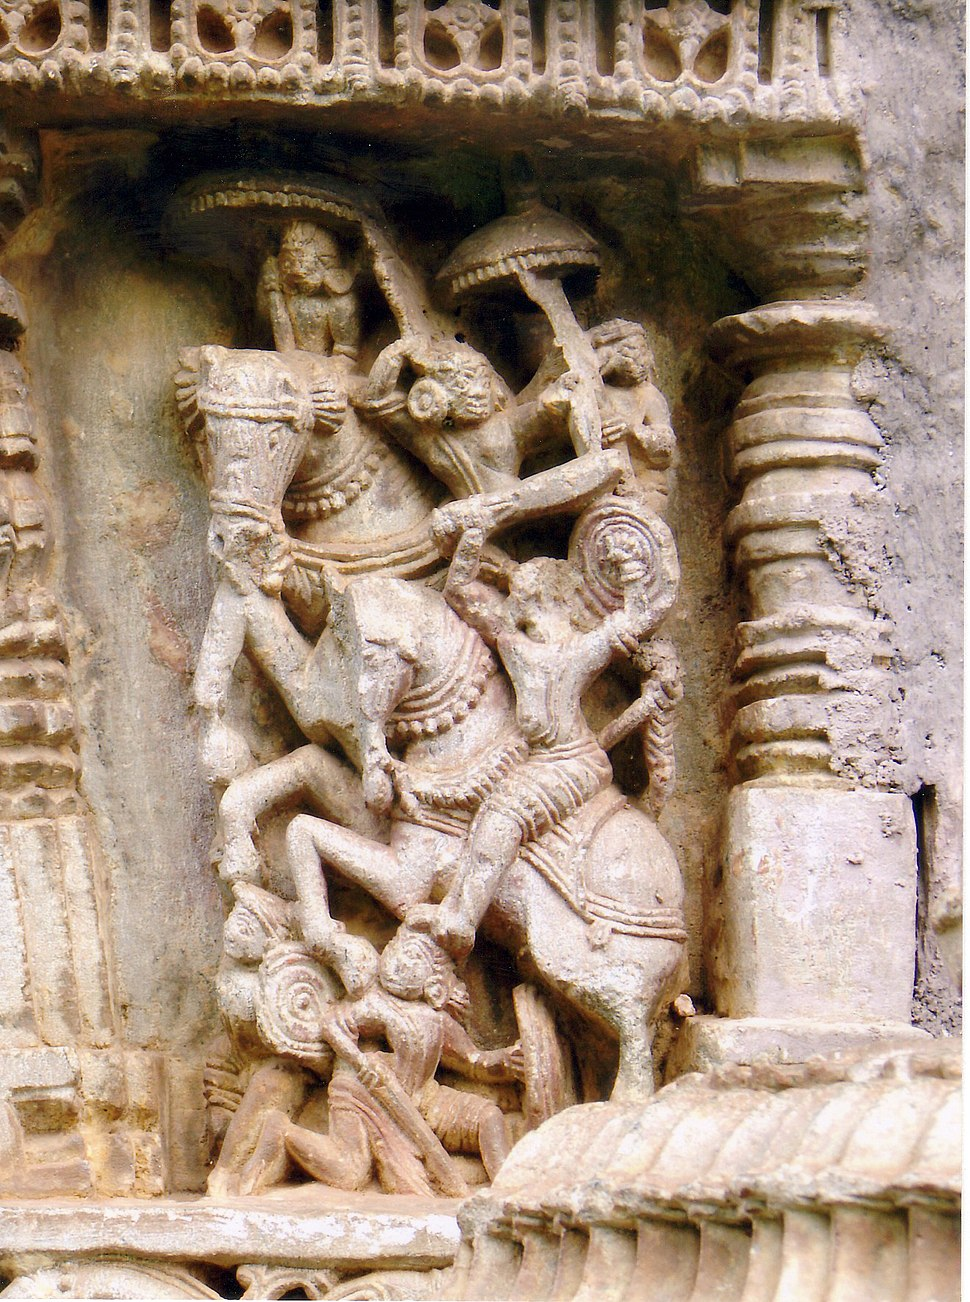 Relief depicting battle scene in the Amruteshvara Temple at Amruthapura in Chikkamagaluru district